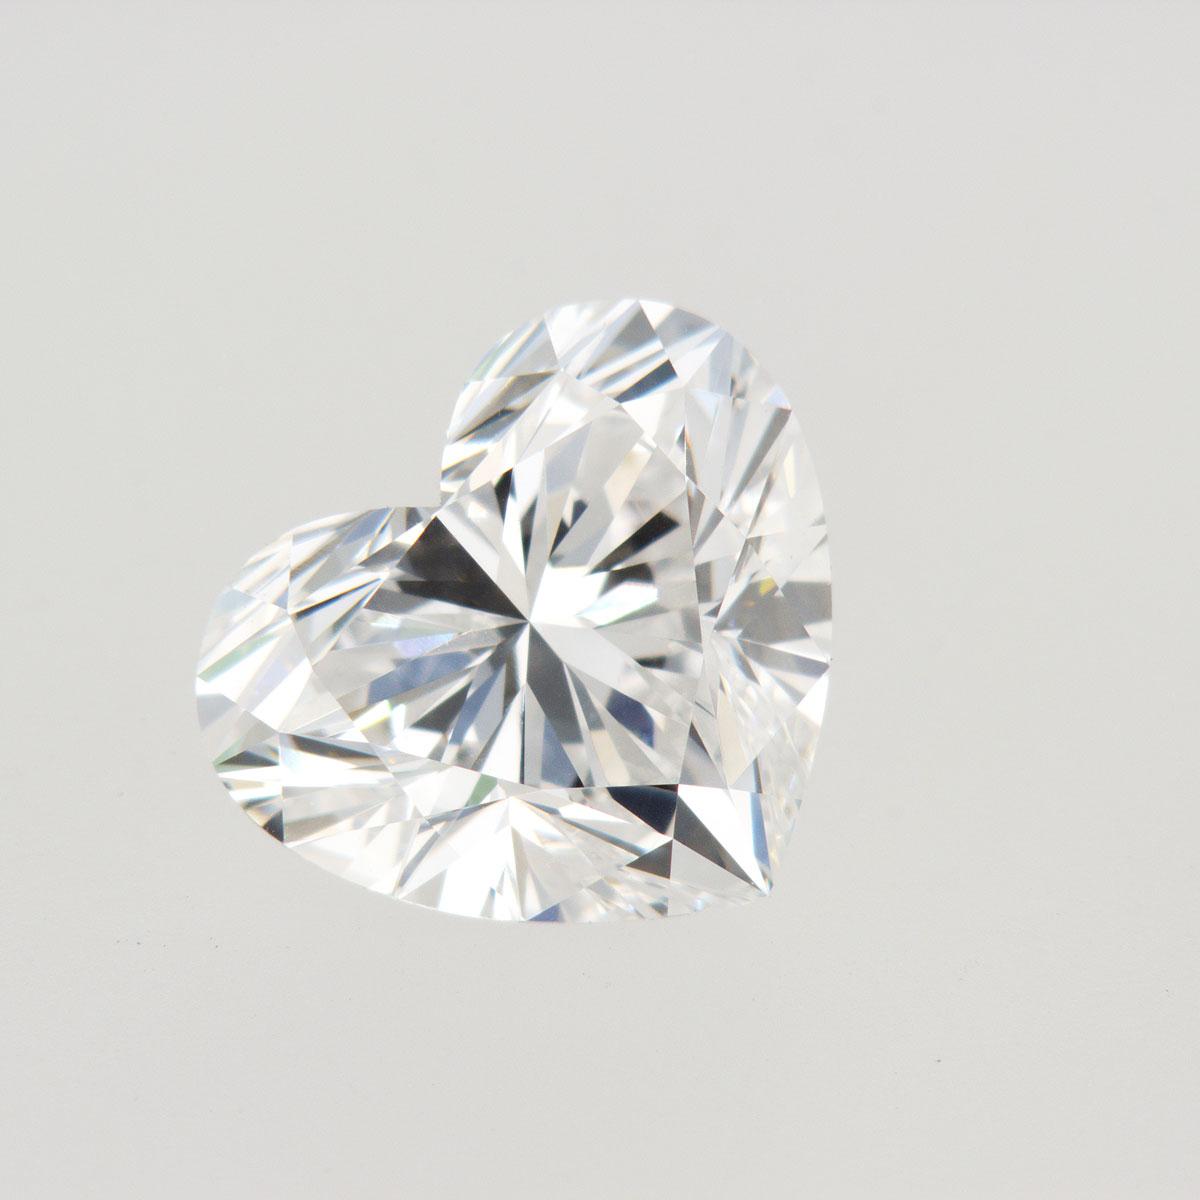 3.02-Carat Heart Brilliant Lab-grown Diamond